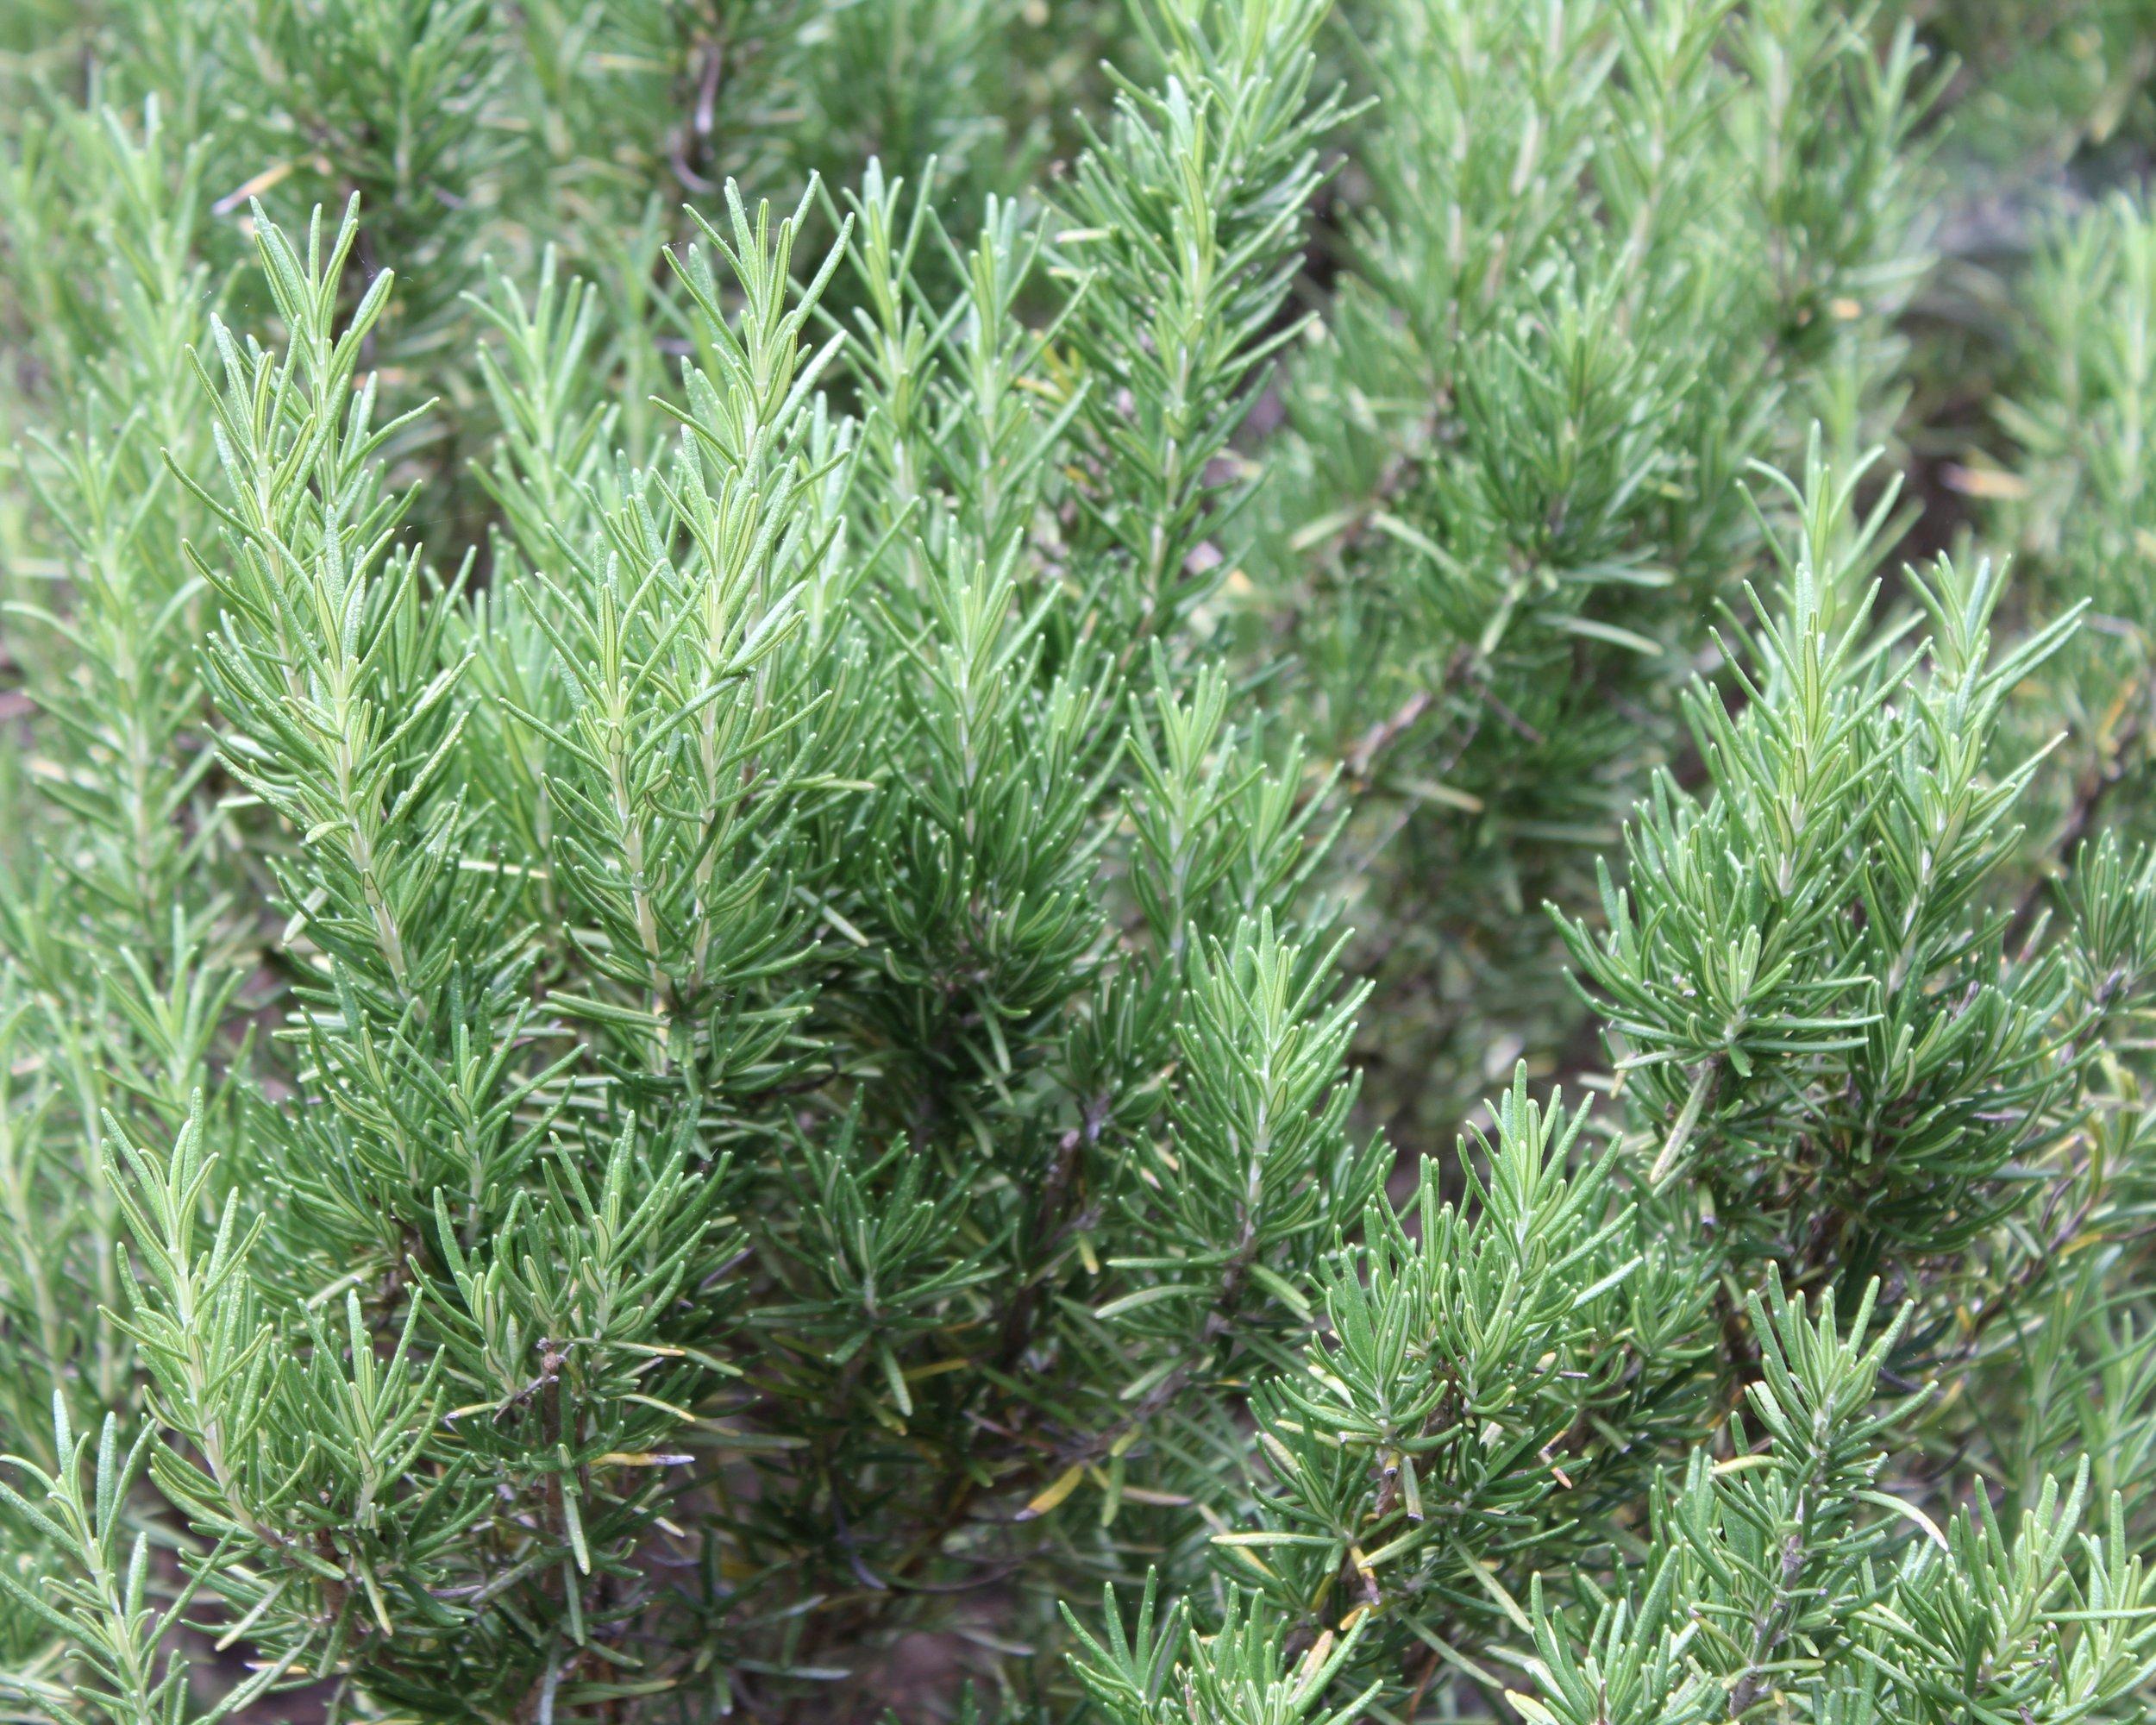 Rosemary,  Rosmarinus officinalis , growing strong!